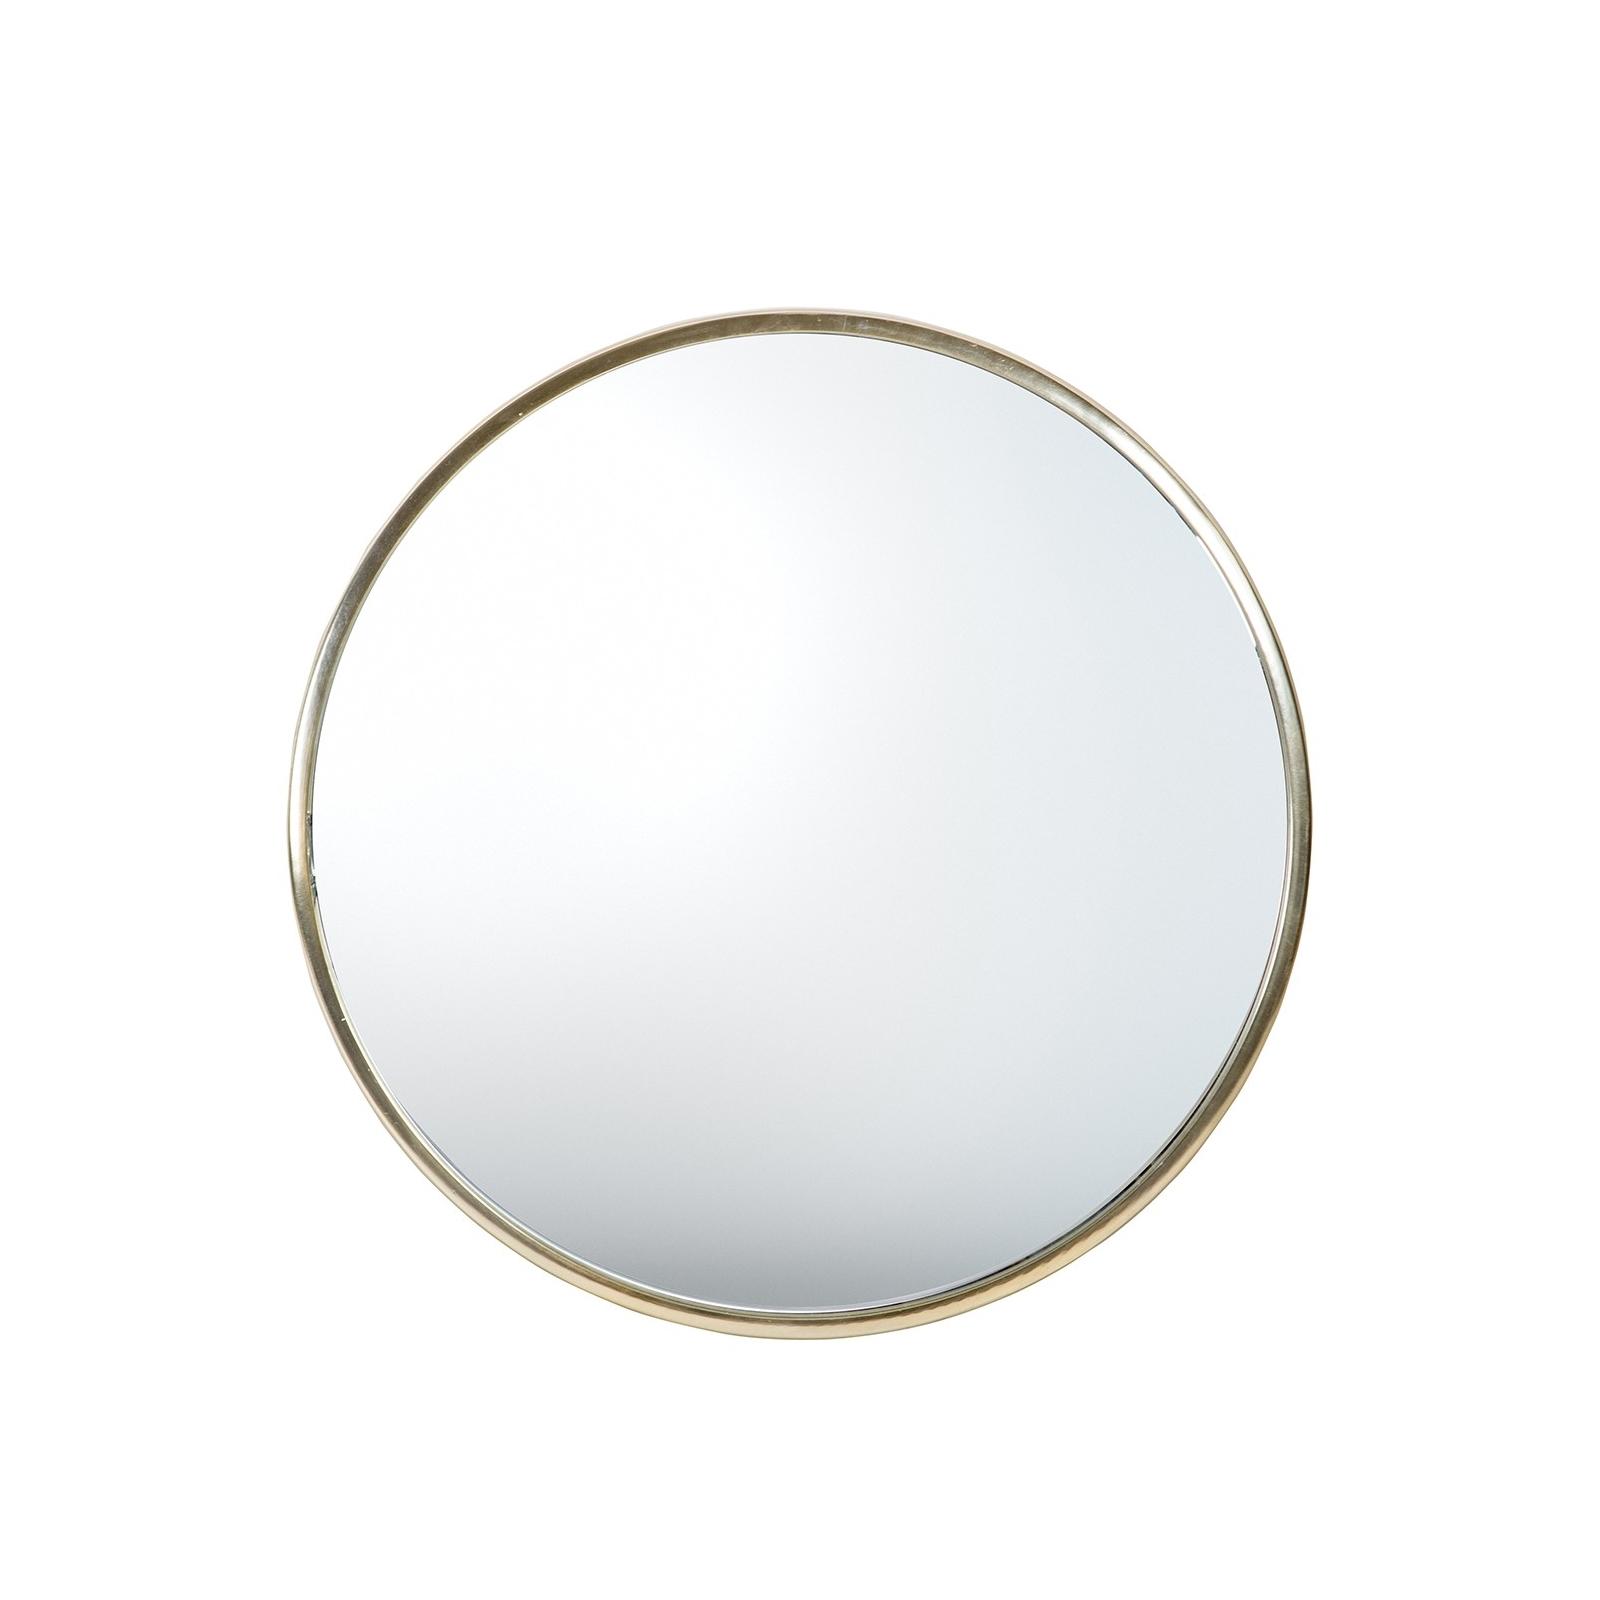 Circle Rund spegel guld 38 cm, Bloomingville